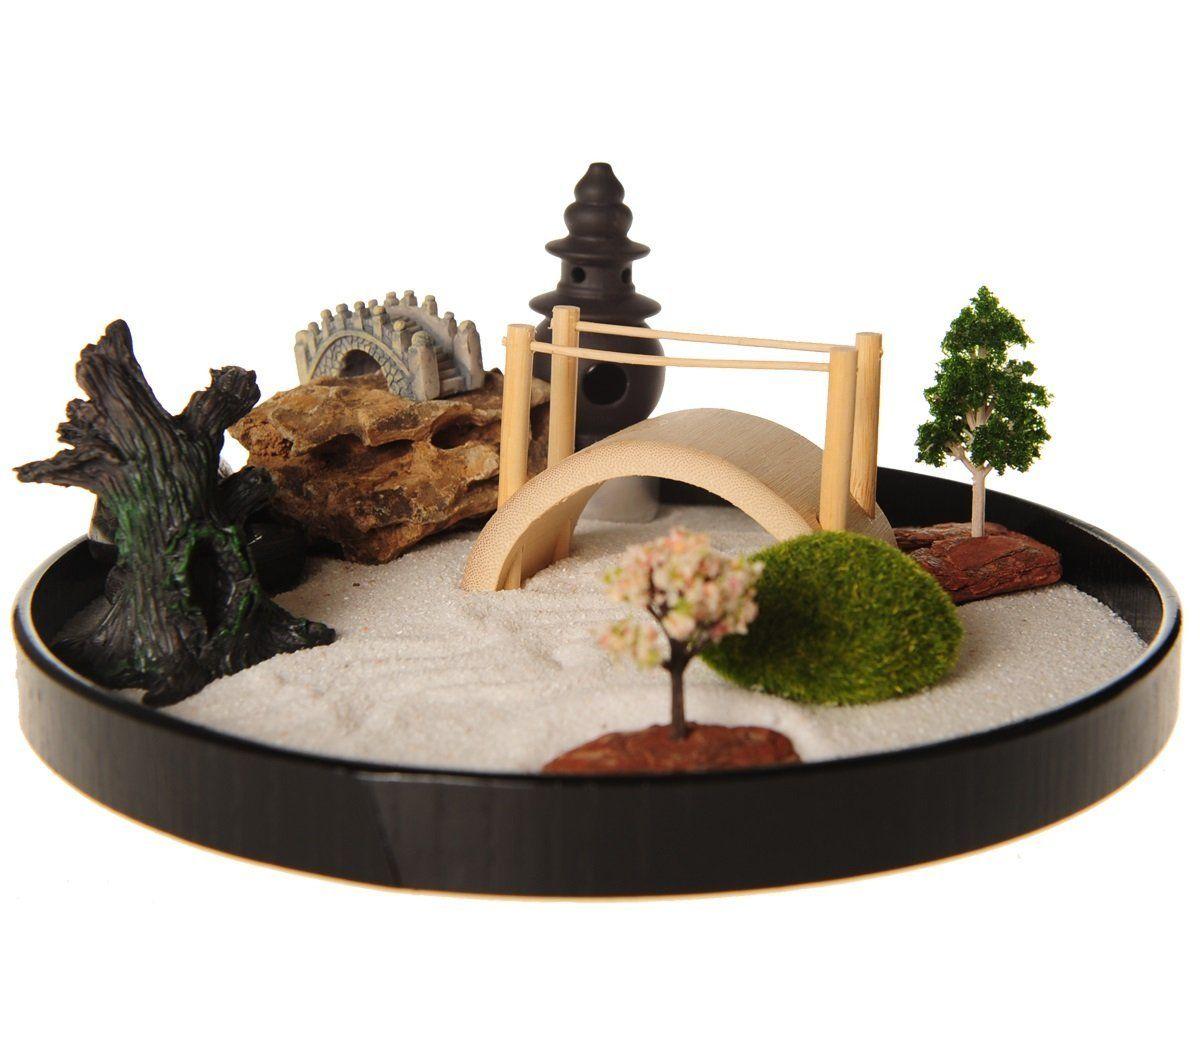 Amazon Com Icnbuys Zen Garden With Boat Bridge Japanese Censers Set With Free Rake And Pushing Sand Pen Zen Garden Diy Miniature Zen Garden Desktop Zen Garden